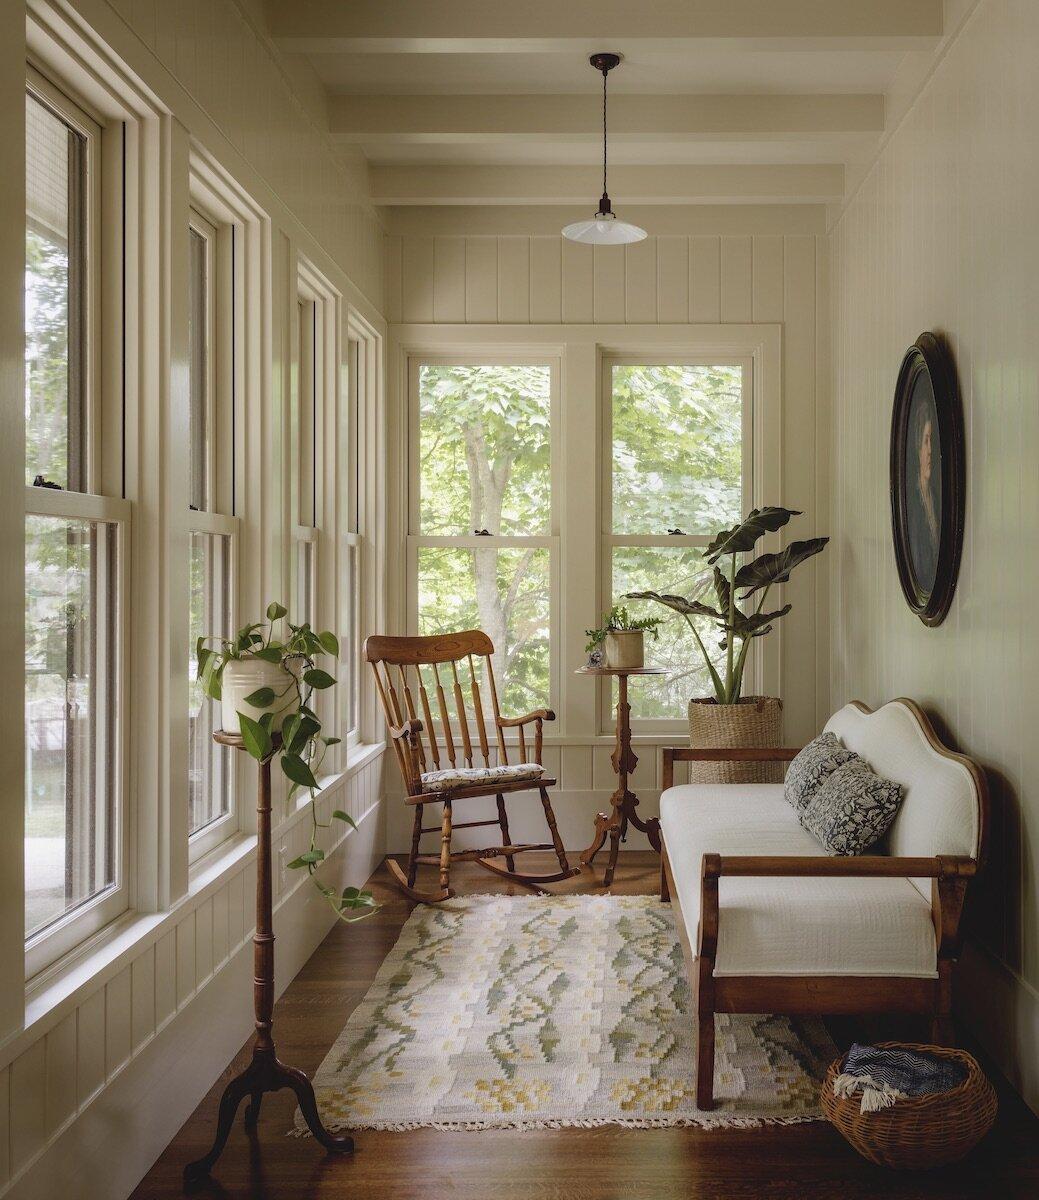 sun-room-iowa-city-house-jessica-helgerson-nordroom